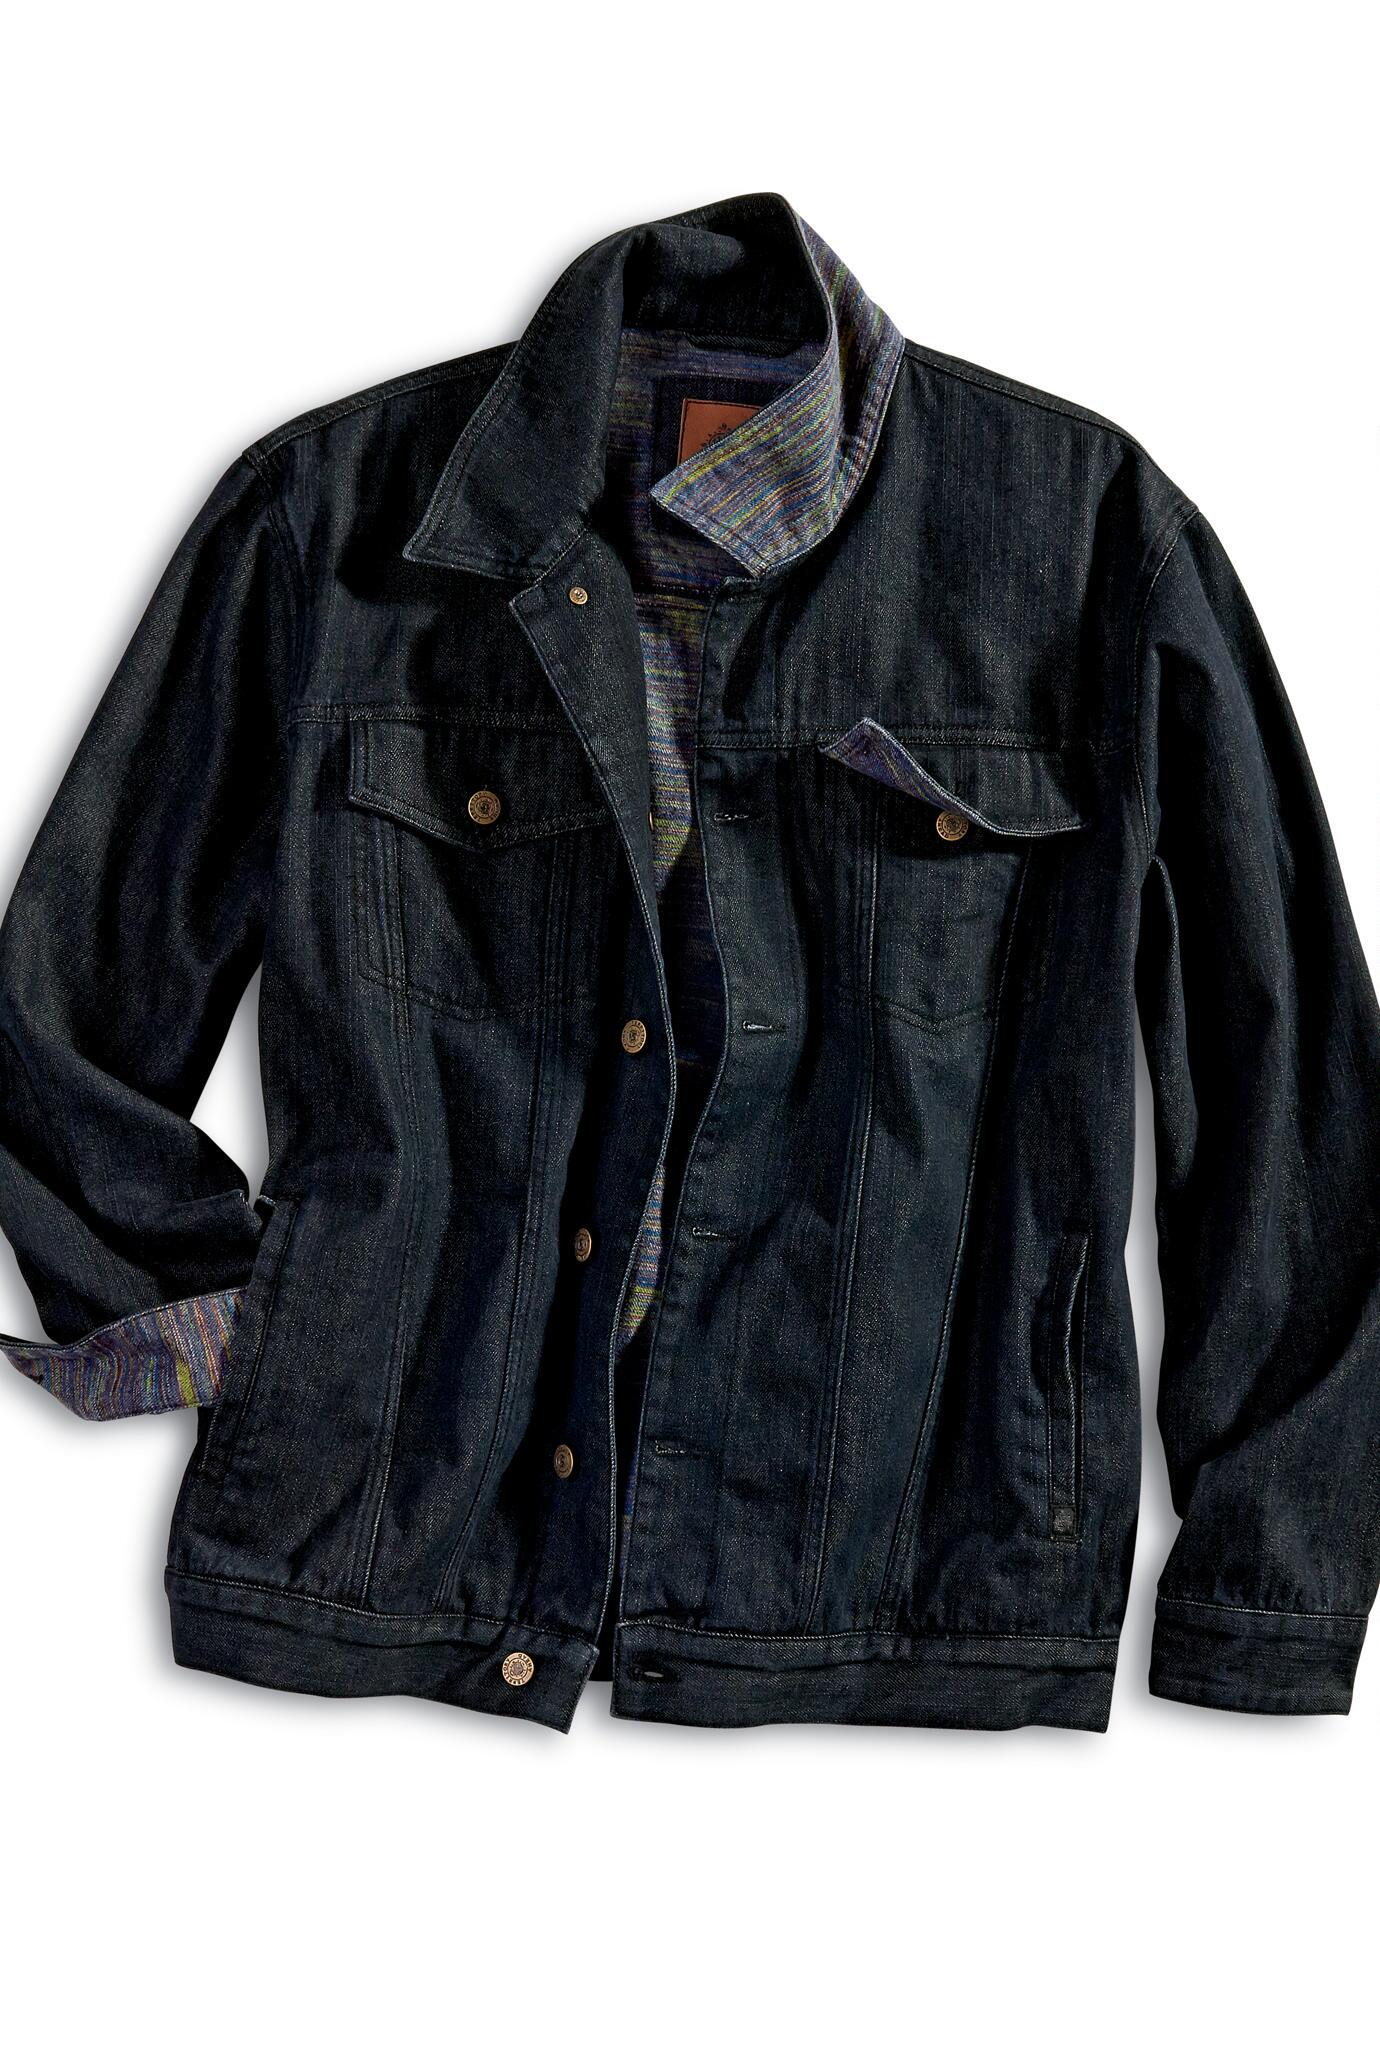 e1a555fe30b 10 Casual Wardrobe Essentials For Cool Temperatures